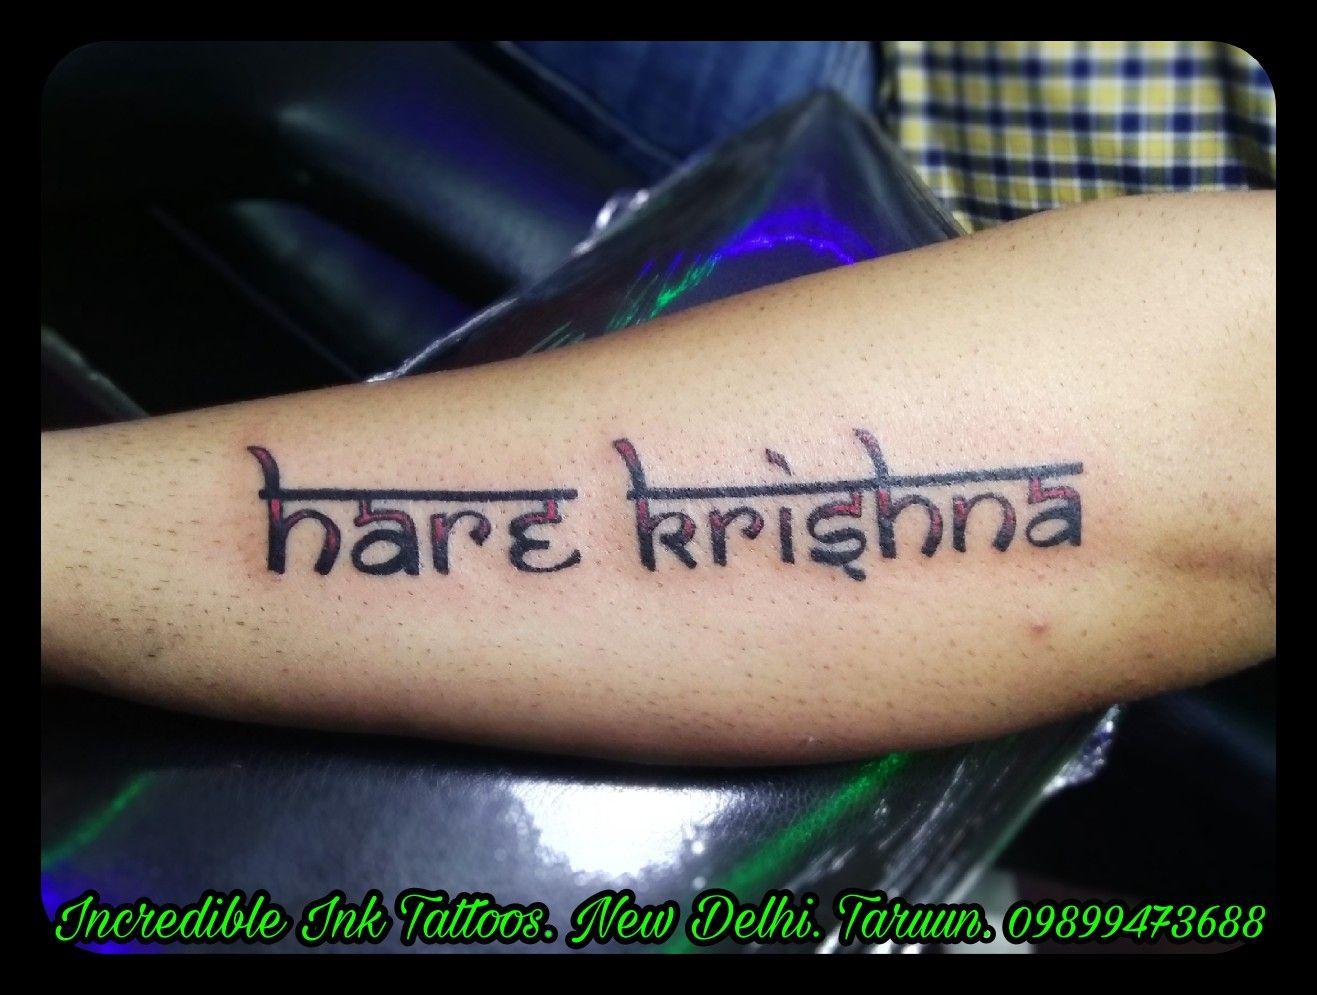 Hare Krishna Tattoo Hare Krishna Tattoo Call And What S App 09899473688 Krishna Tattoo Tattoos Small Tattoos